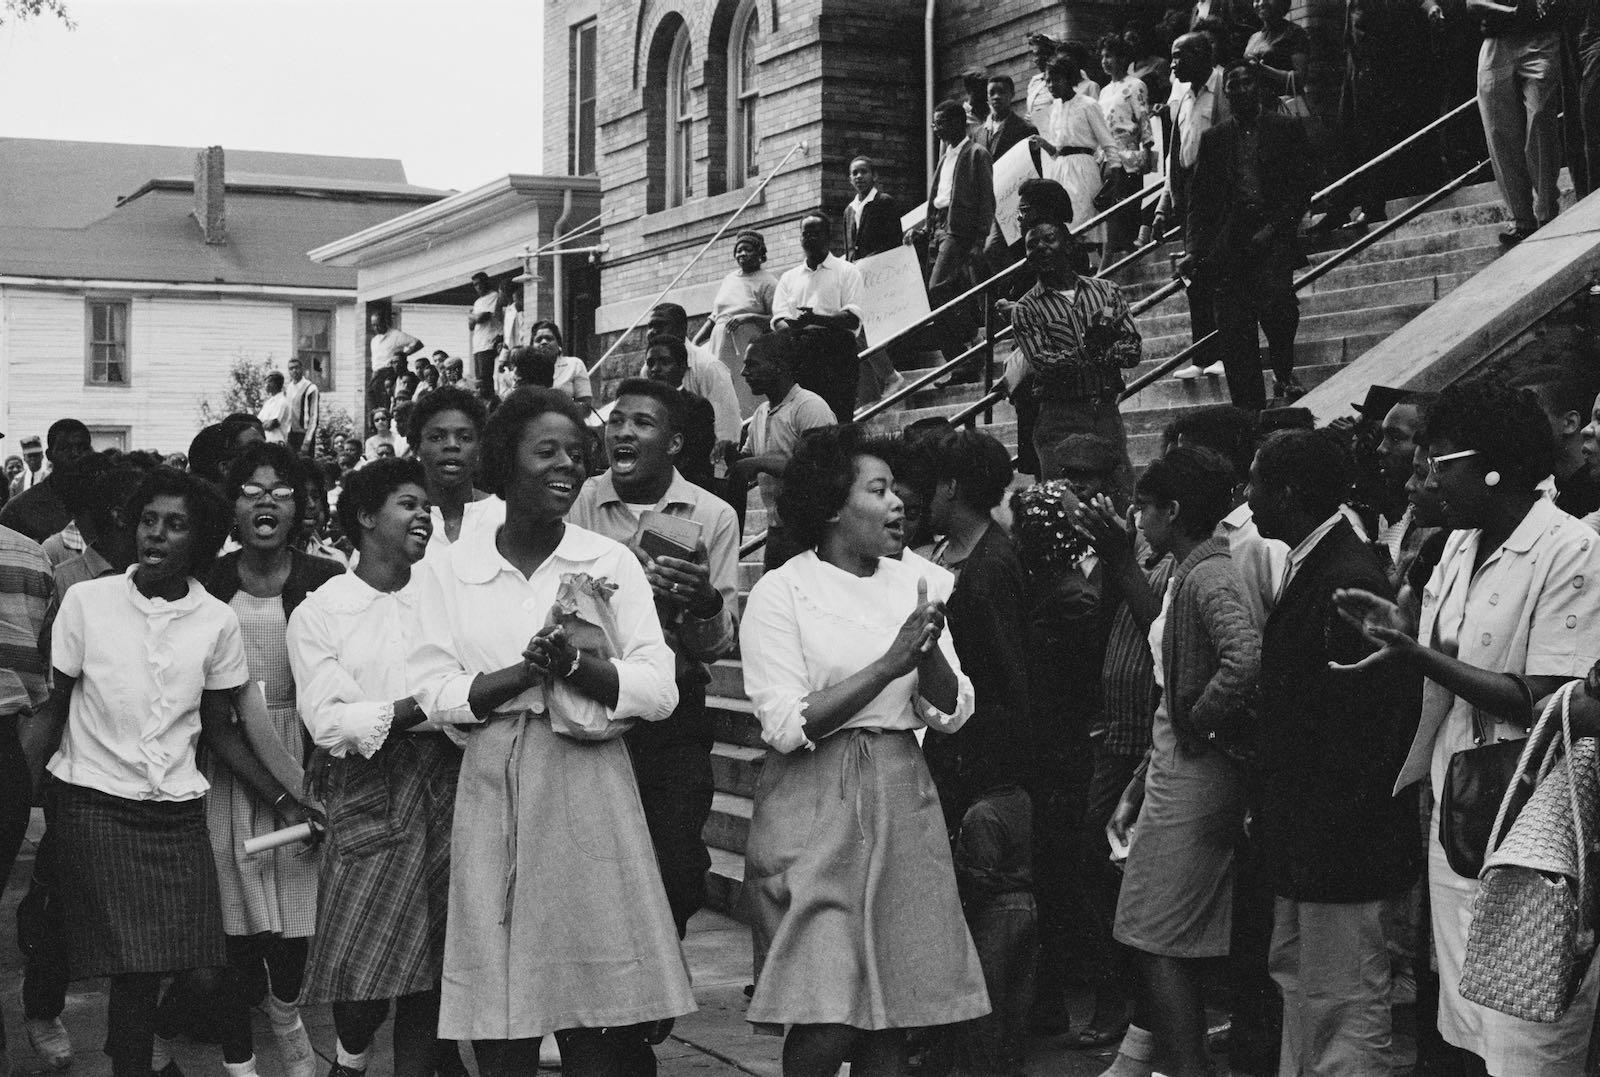 Demonstration at the 16th Street Baptist Church, Birmingham, Alabama, 1963